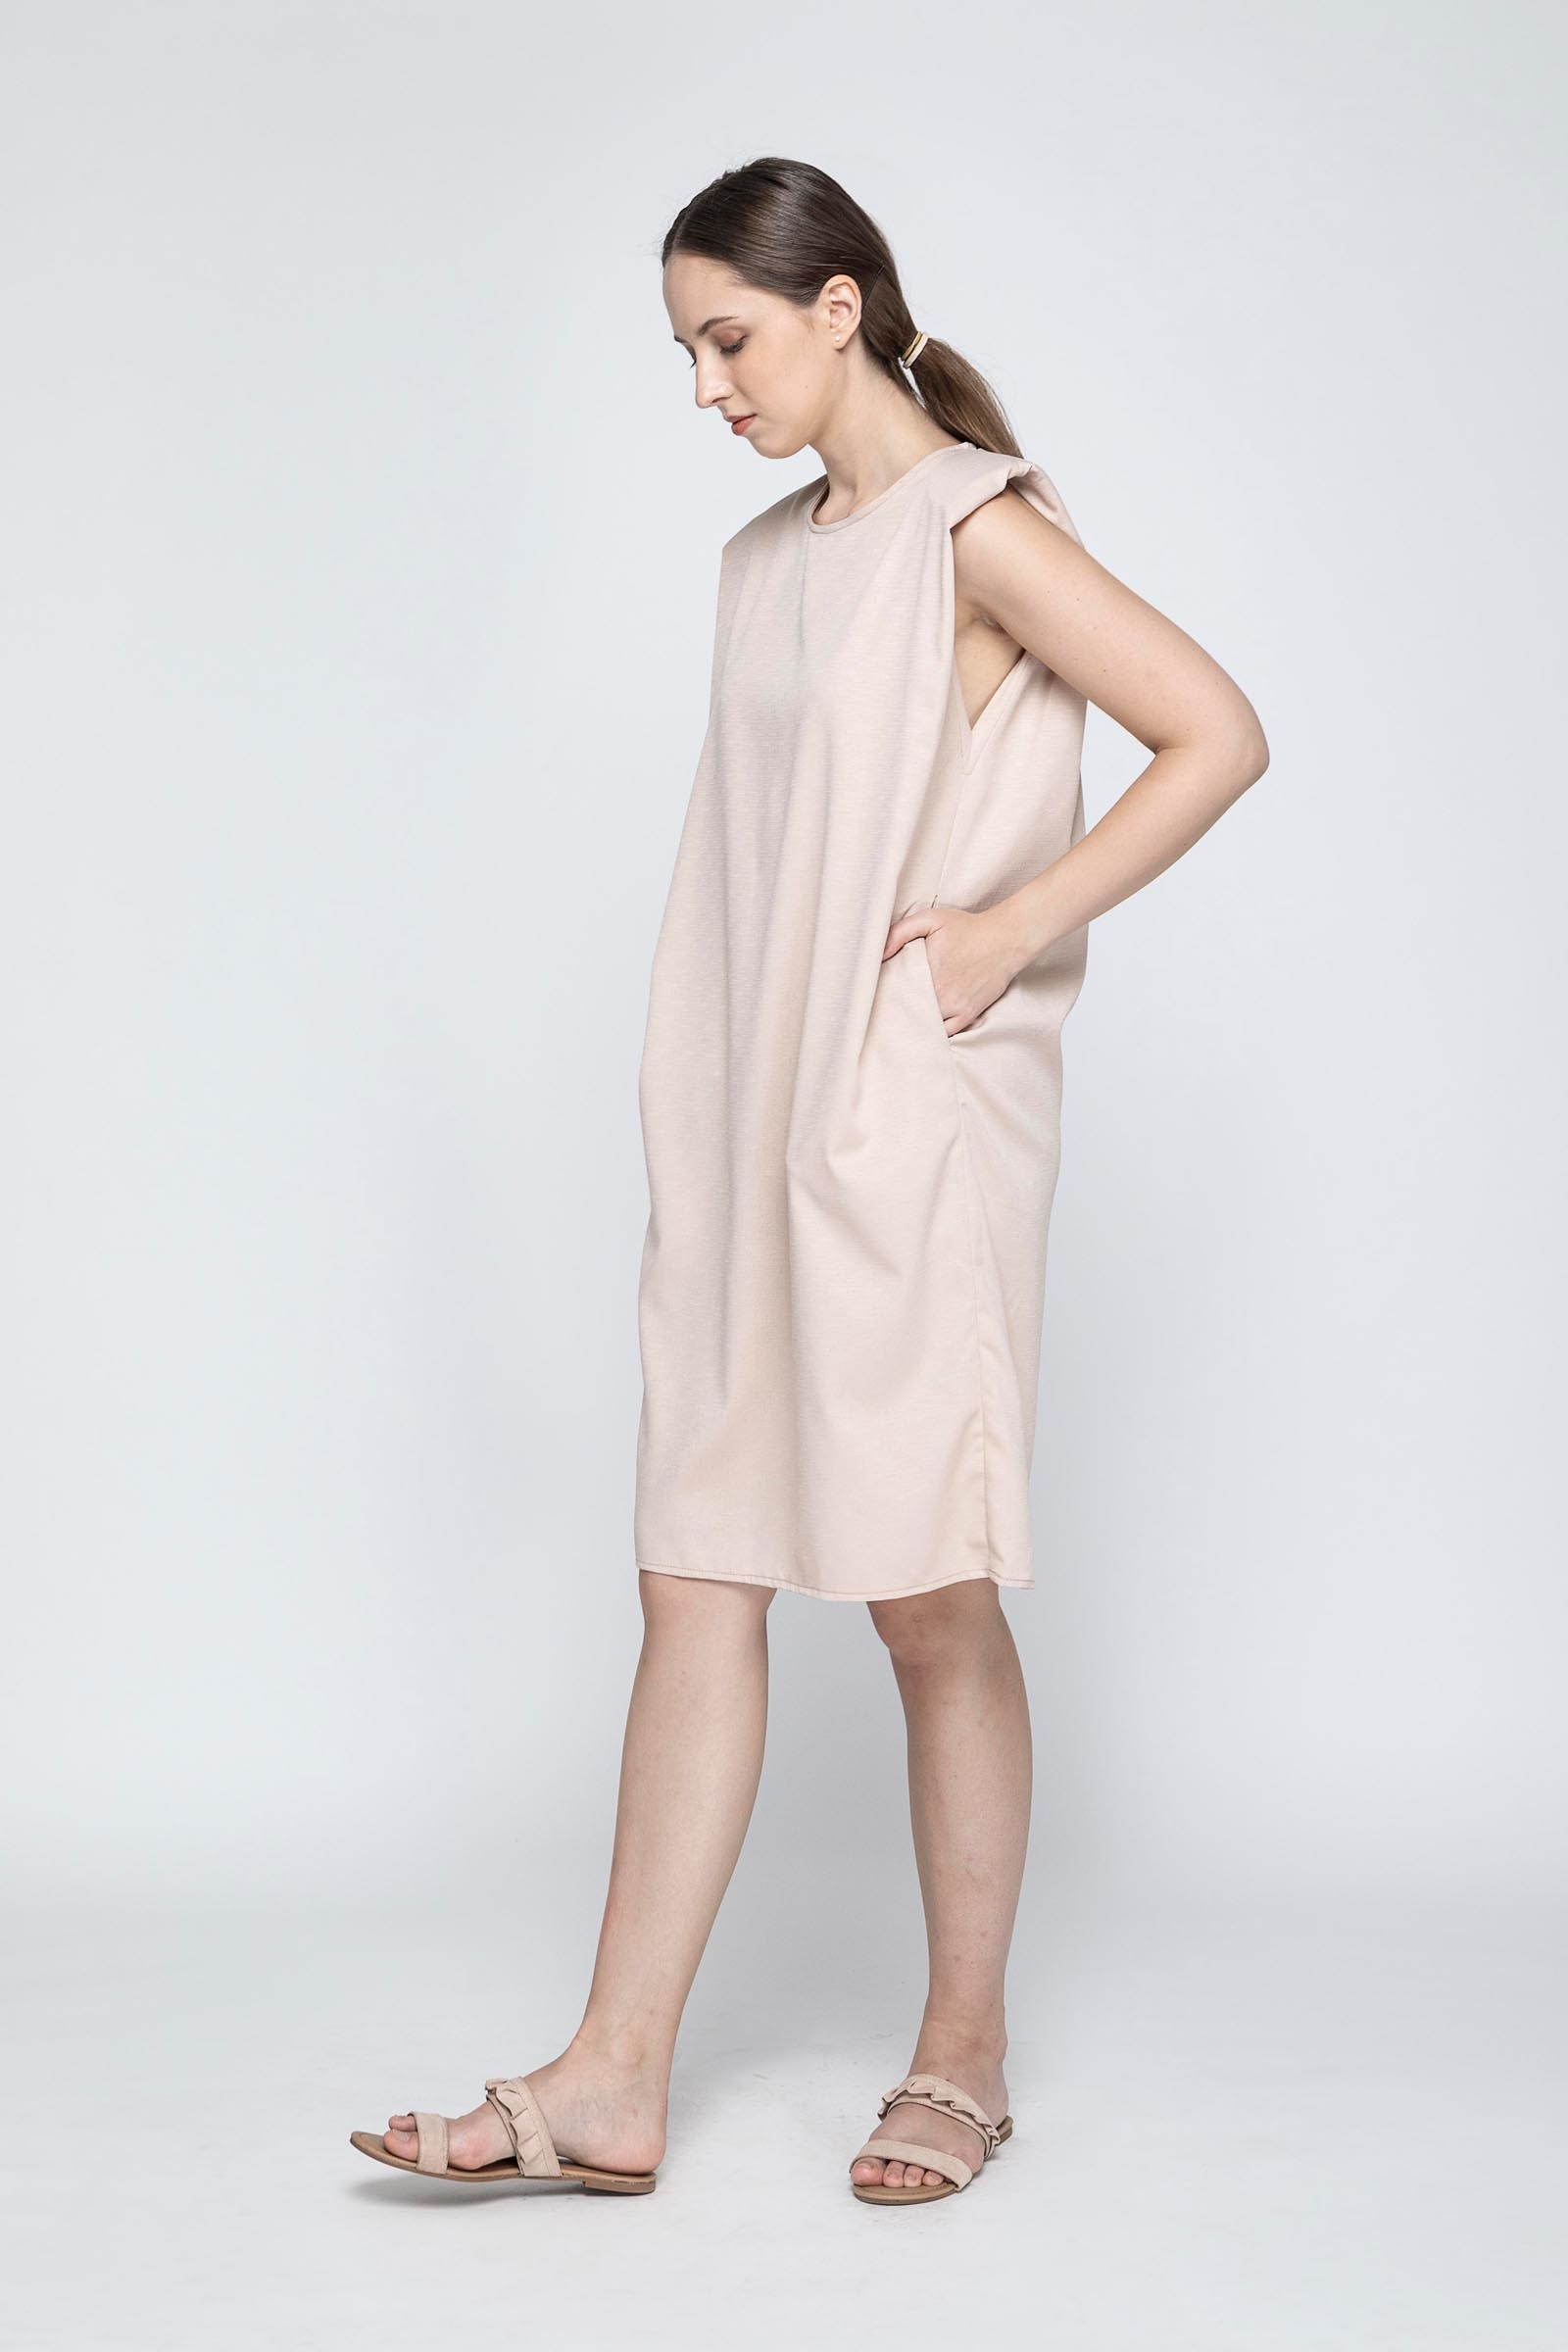 Picture of Biku Dress